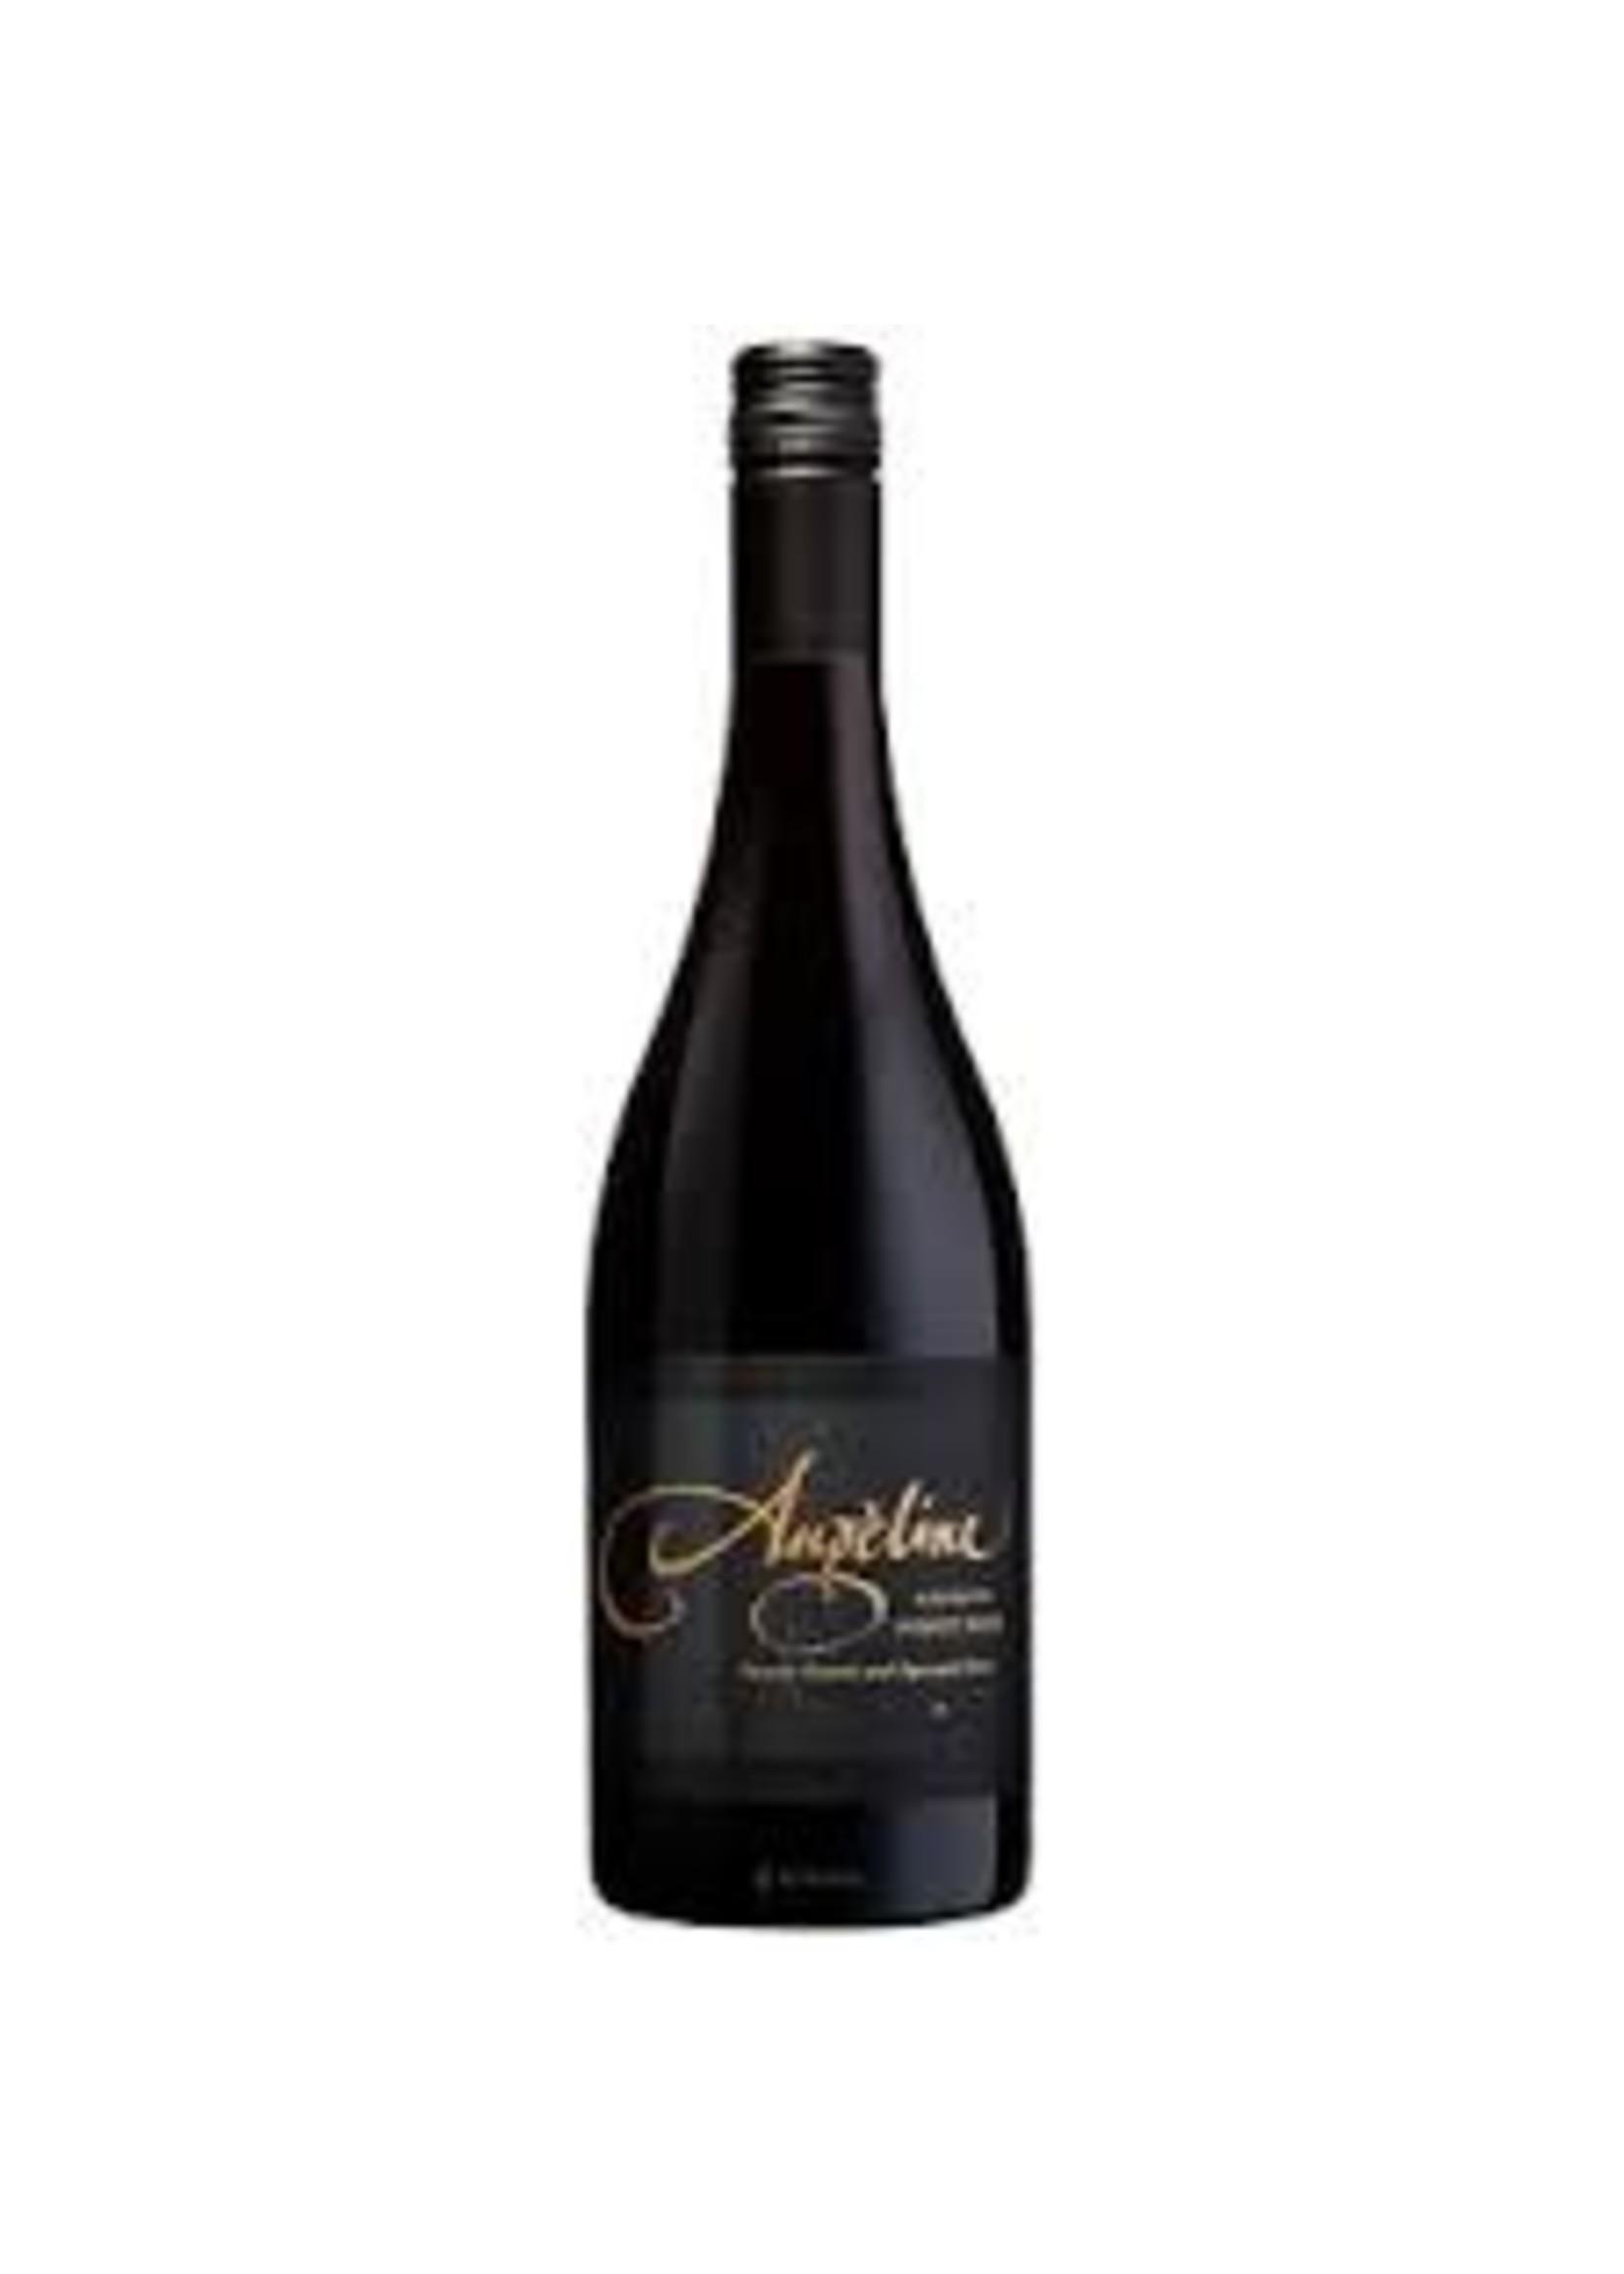 Angeline 2018 Pinot Noir Reserve 750ml